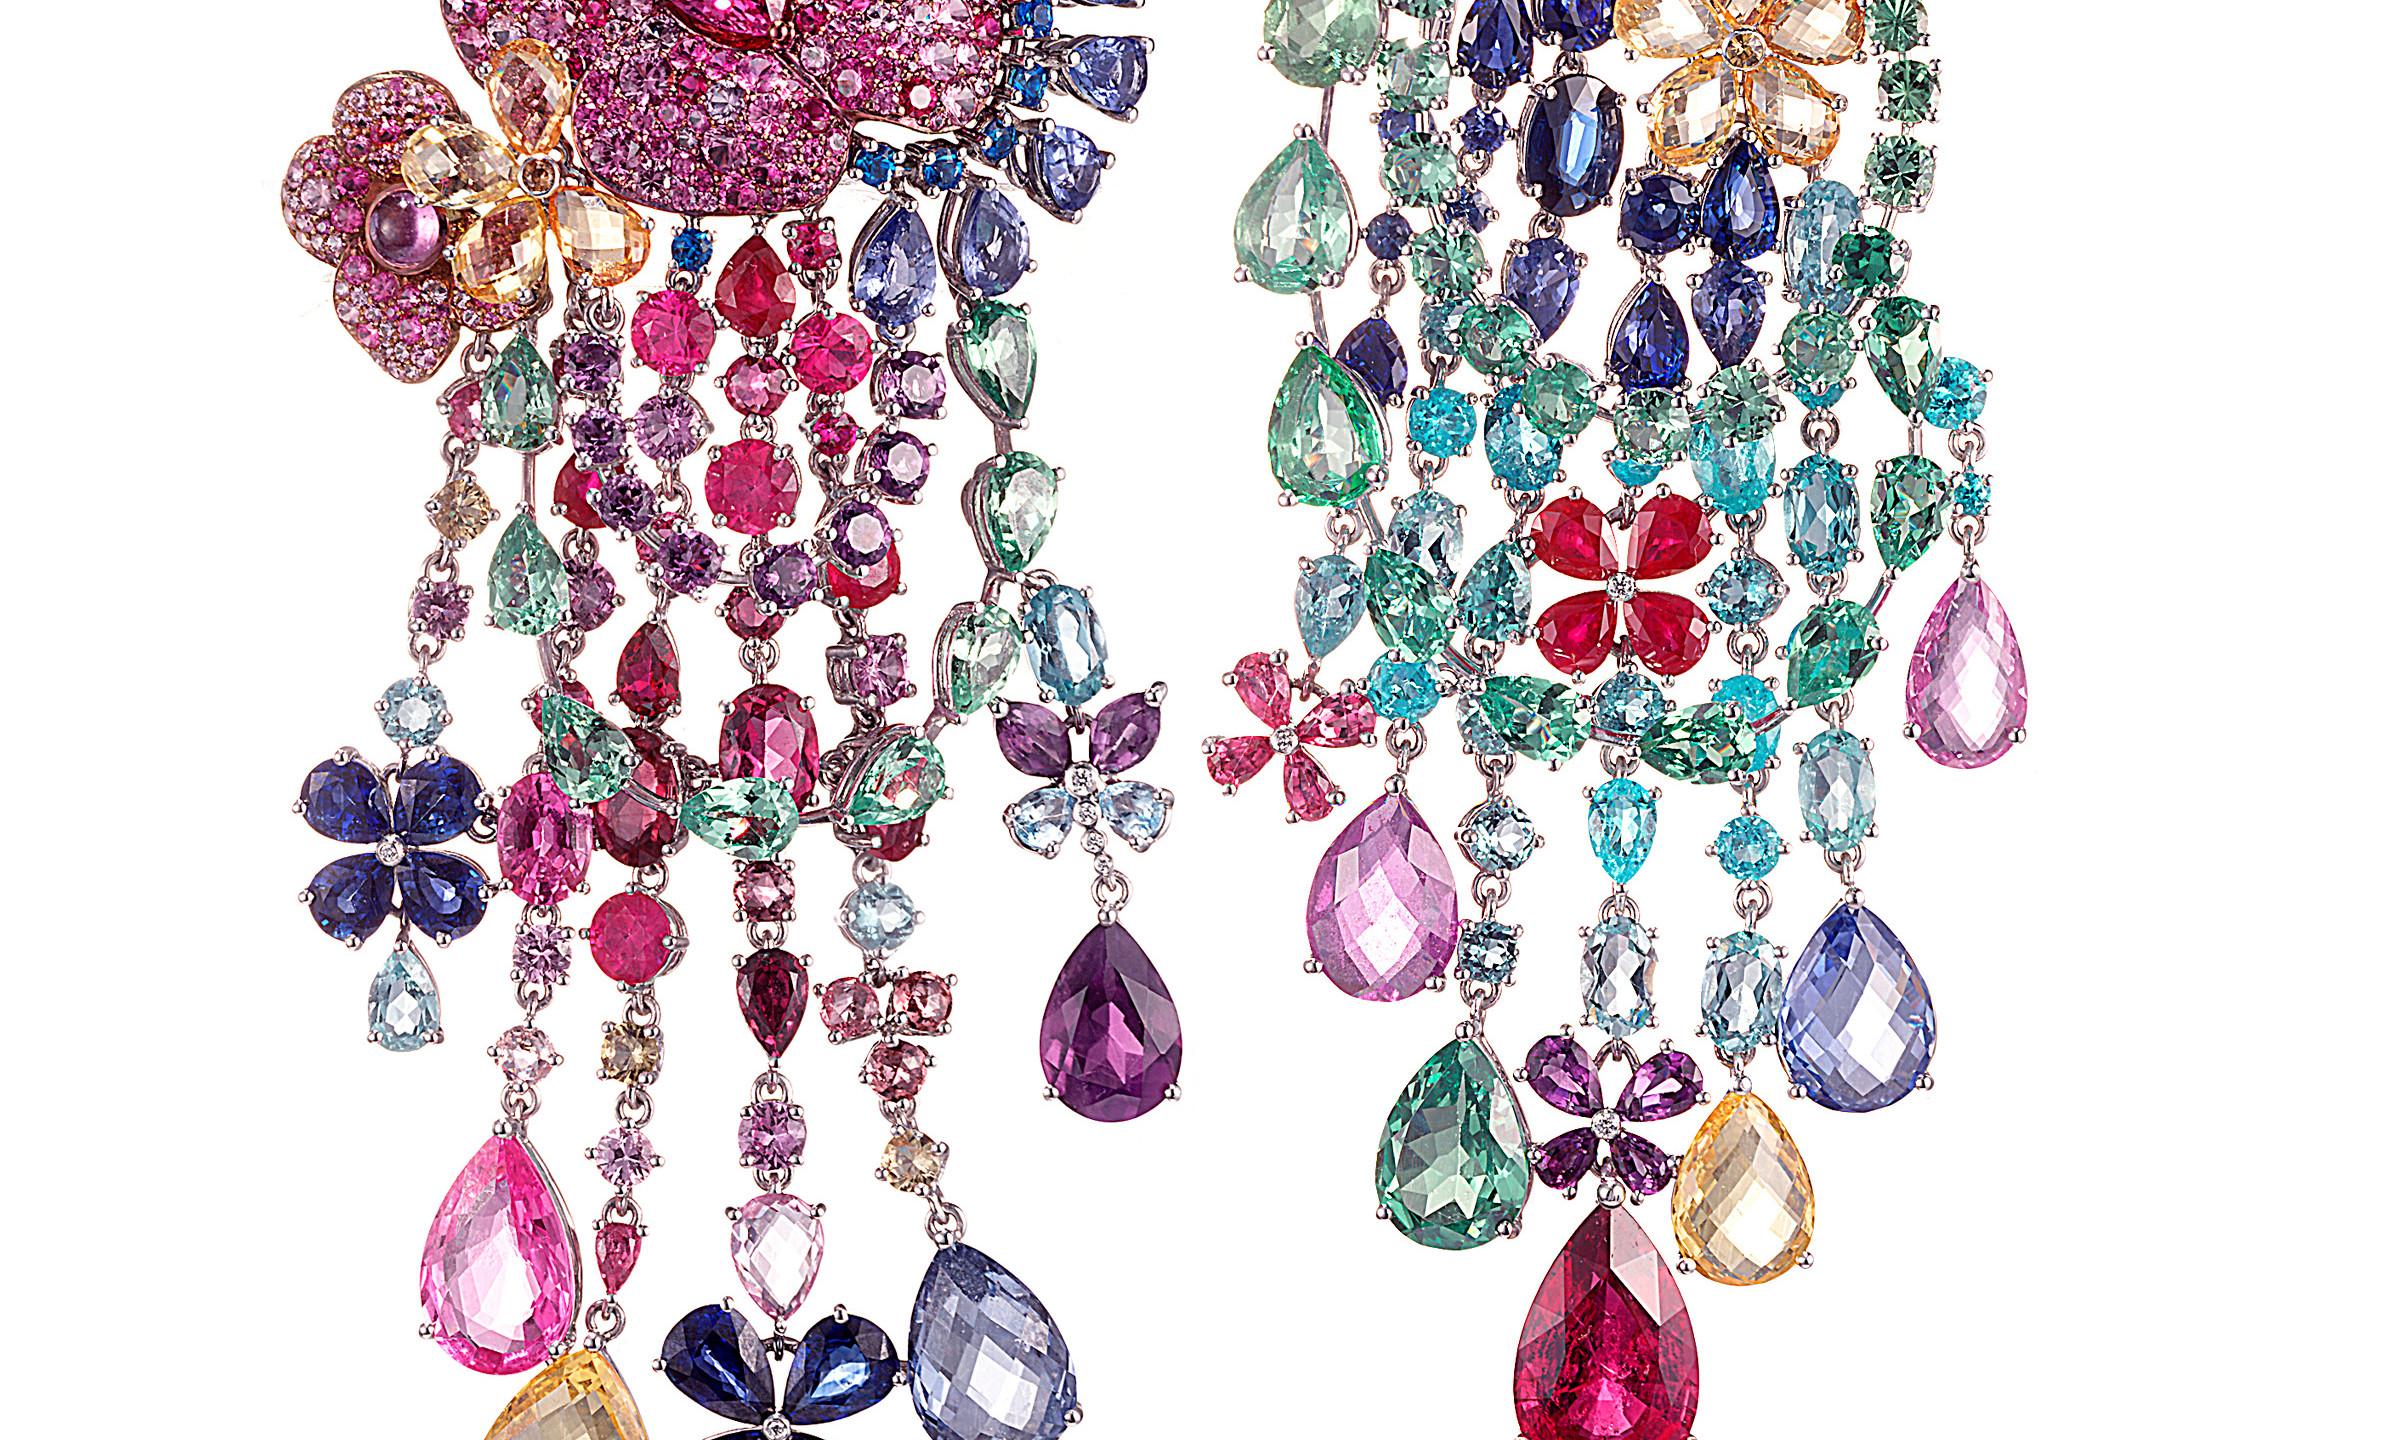 RIHANNA-LOVES-CHOPARD-Haute-Joaillerie-collection-earrings-1